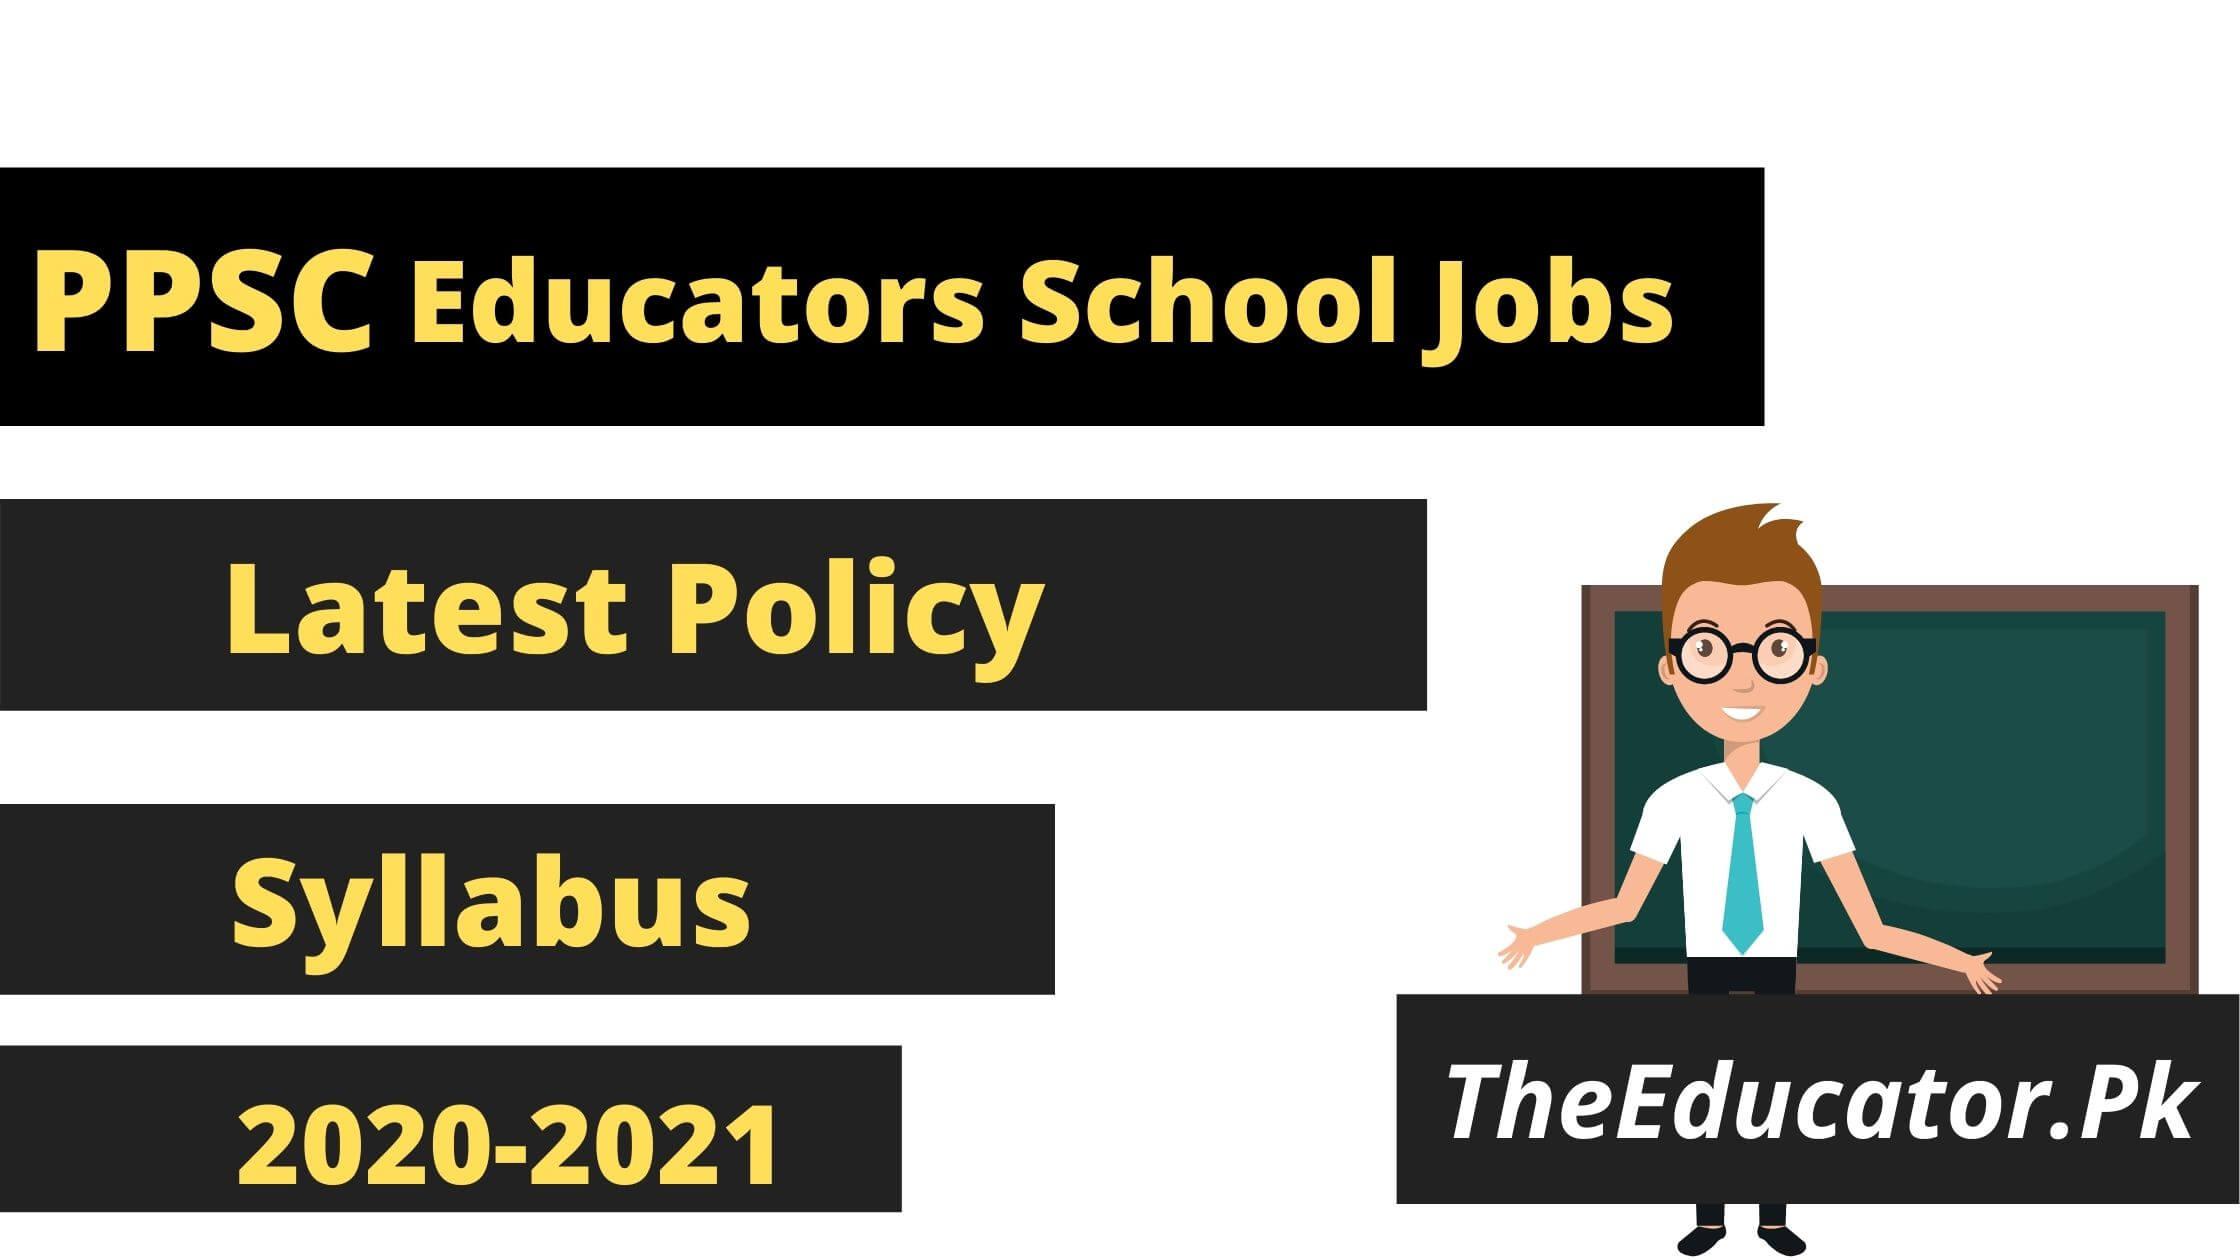 ppsc educators jobs 2021 in Punjab